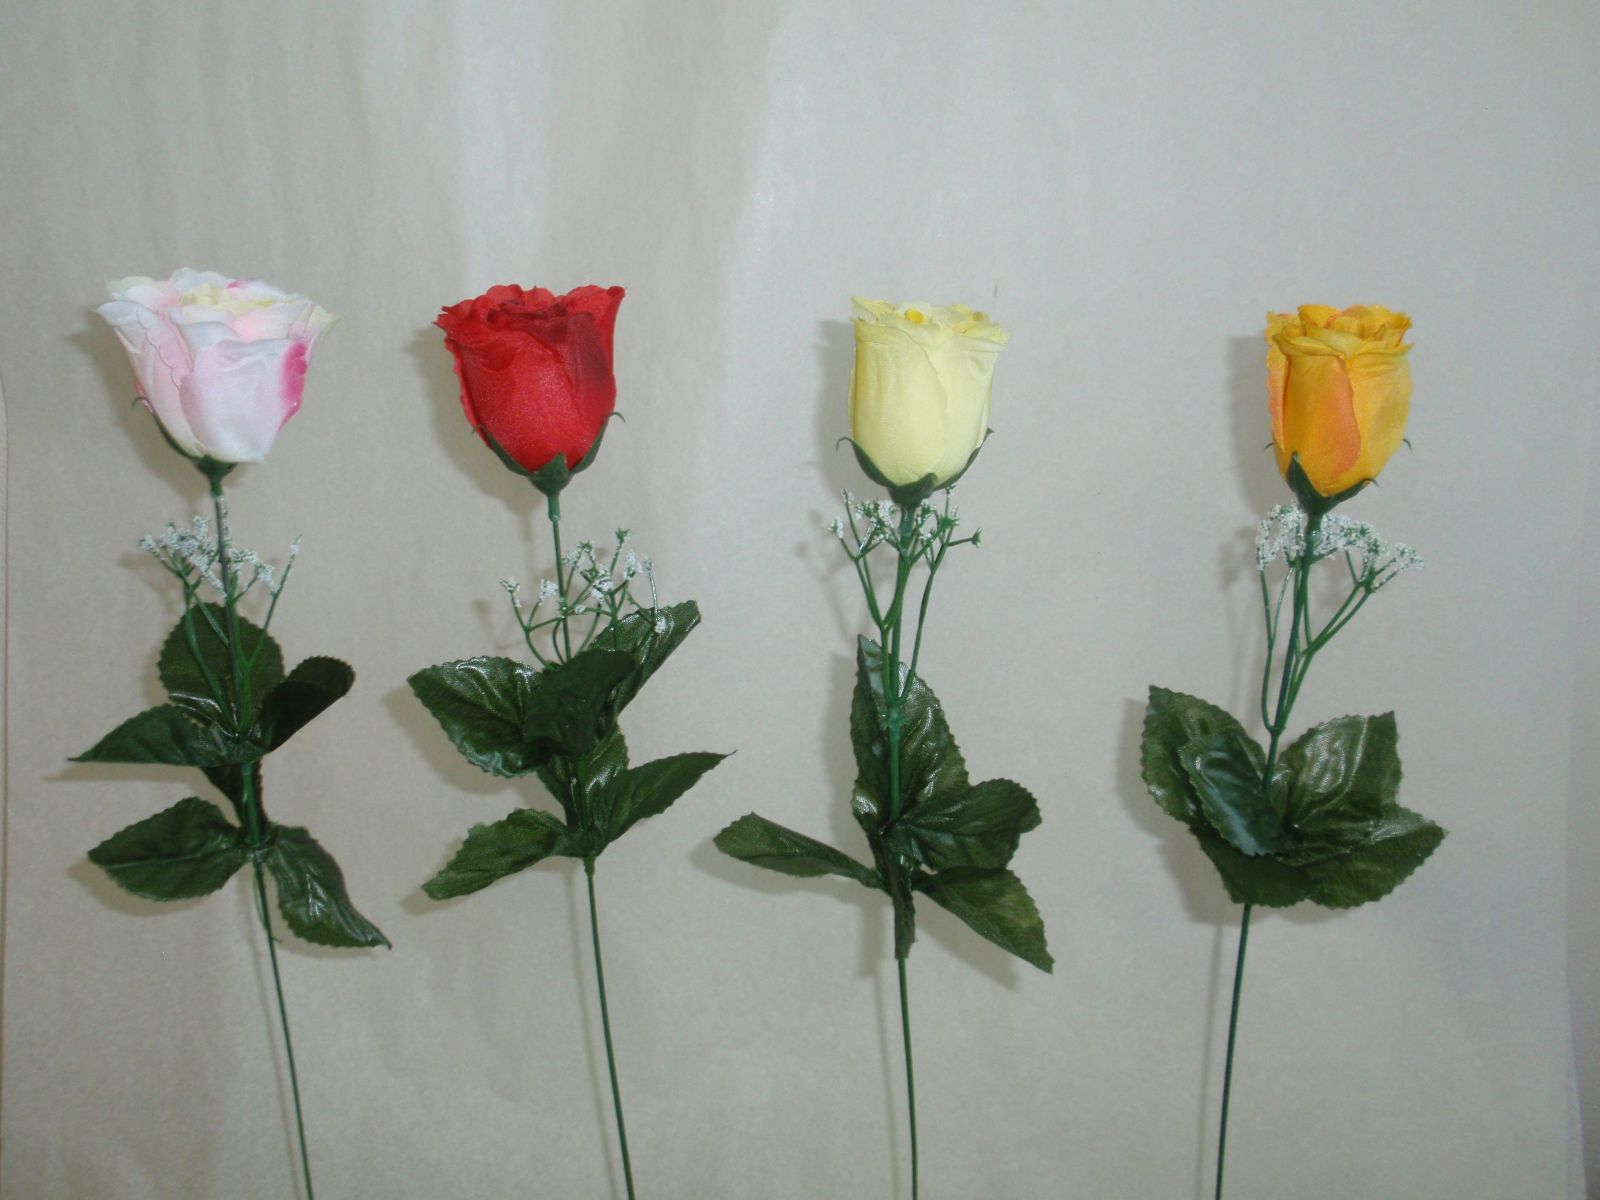 Růže - sólo, MIX 4 barvy